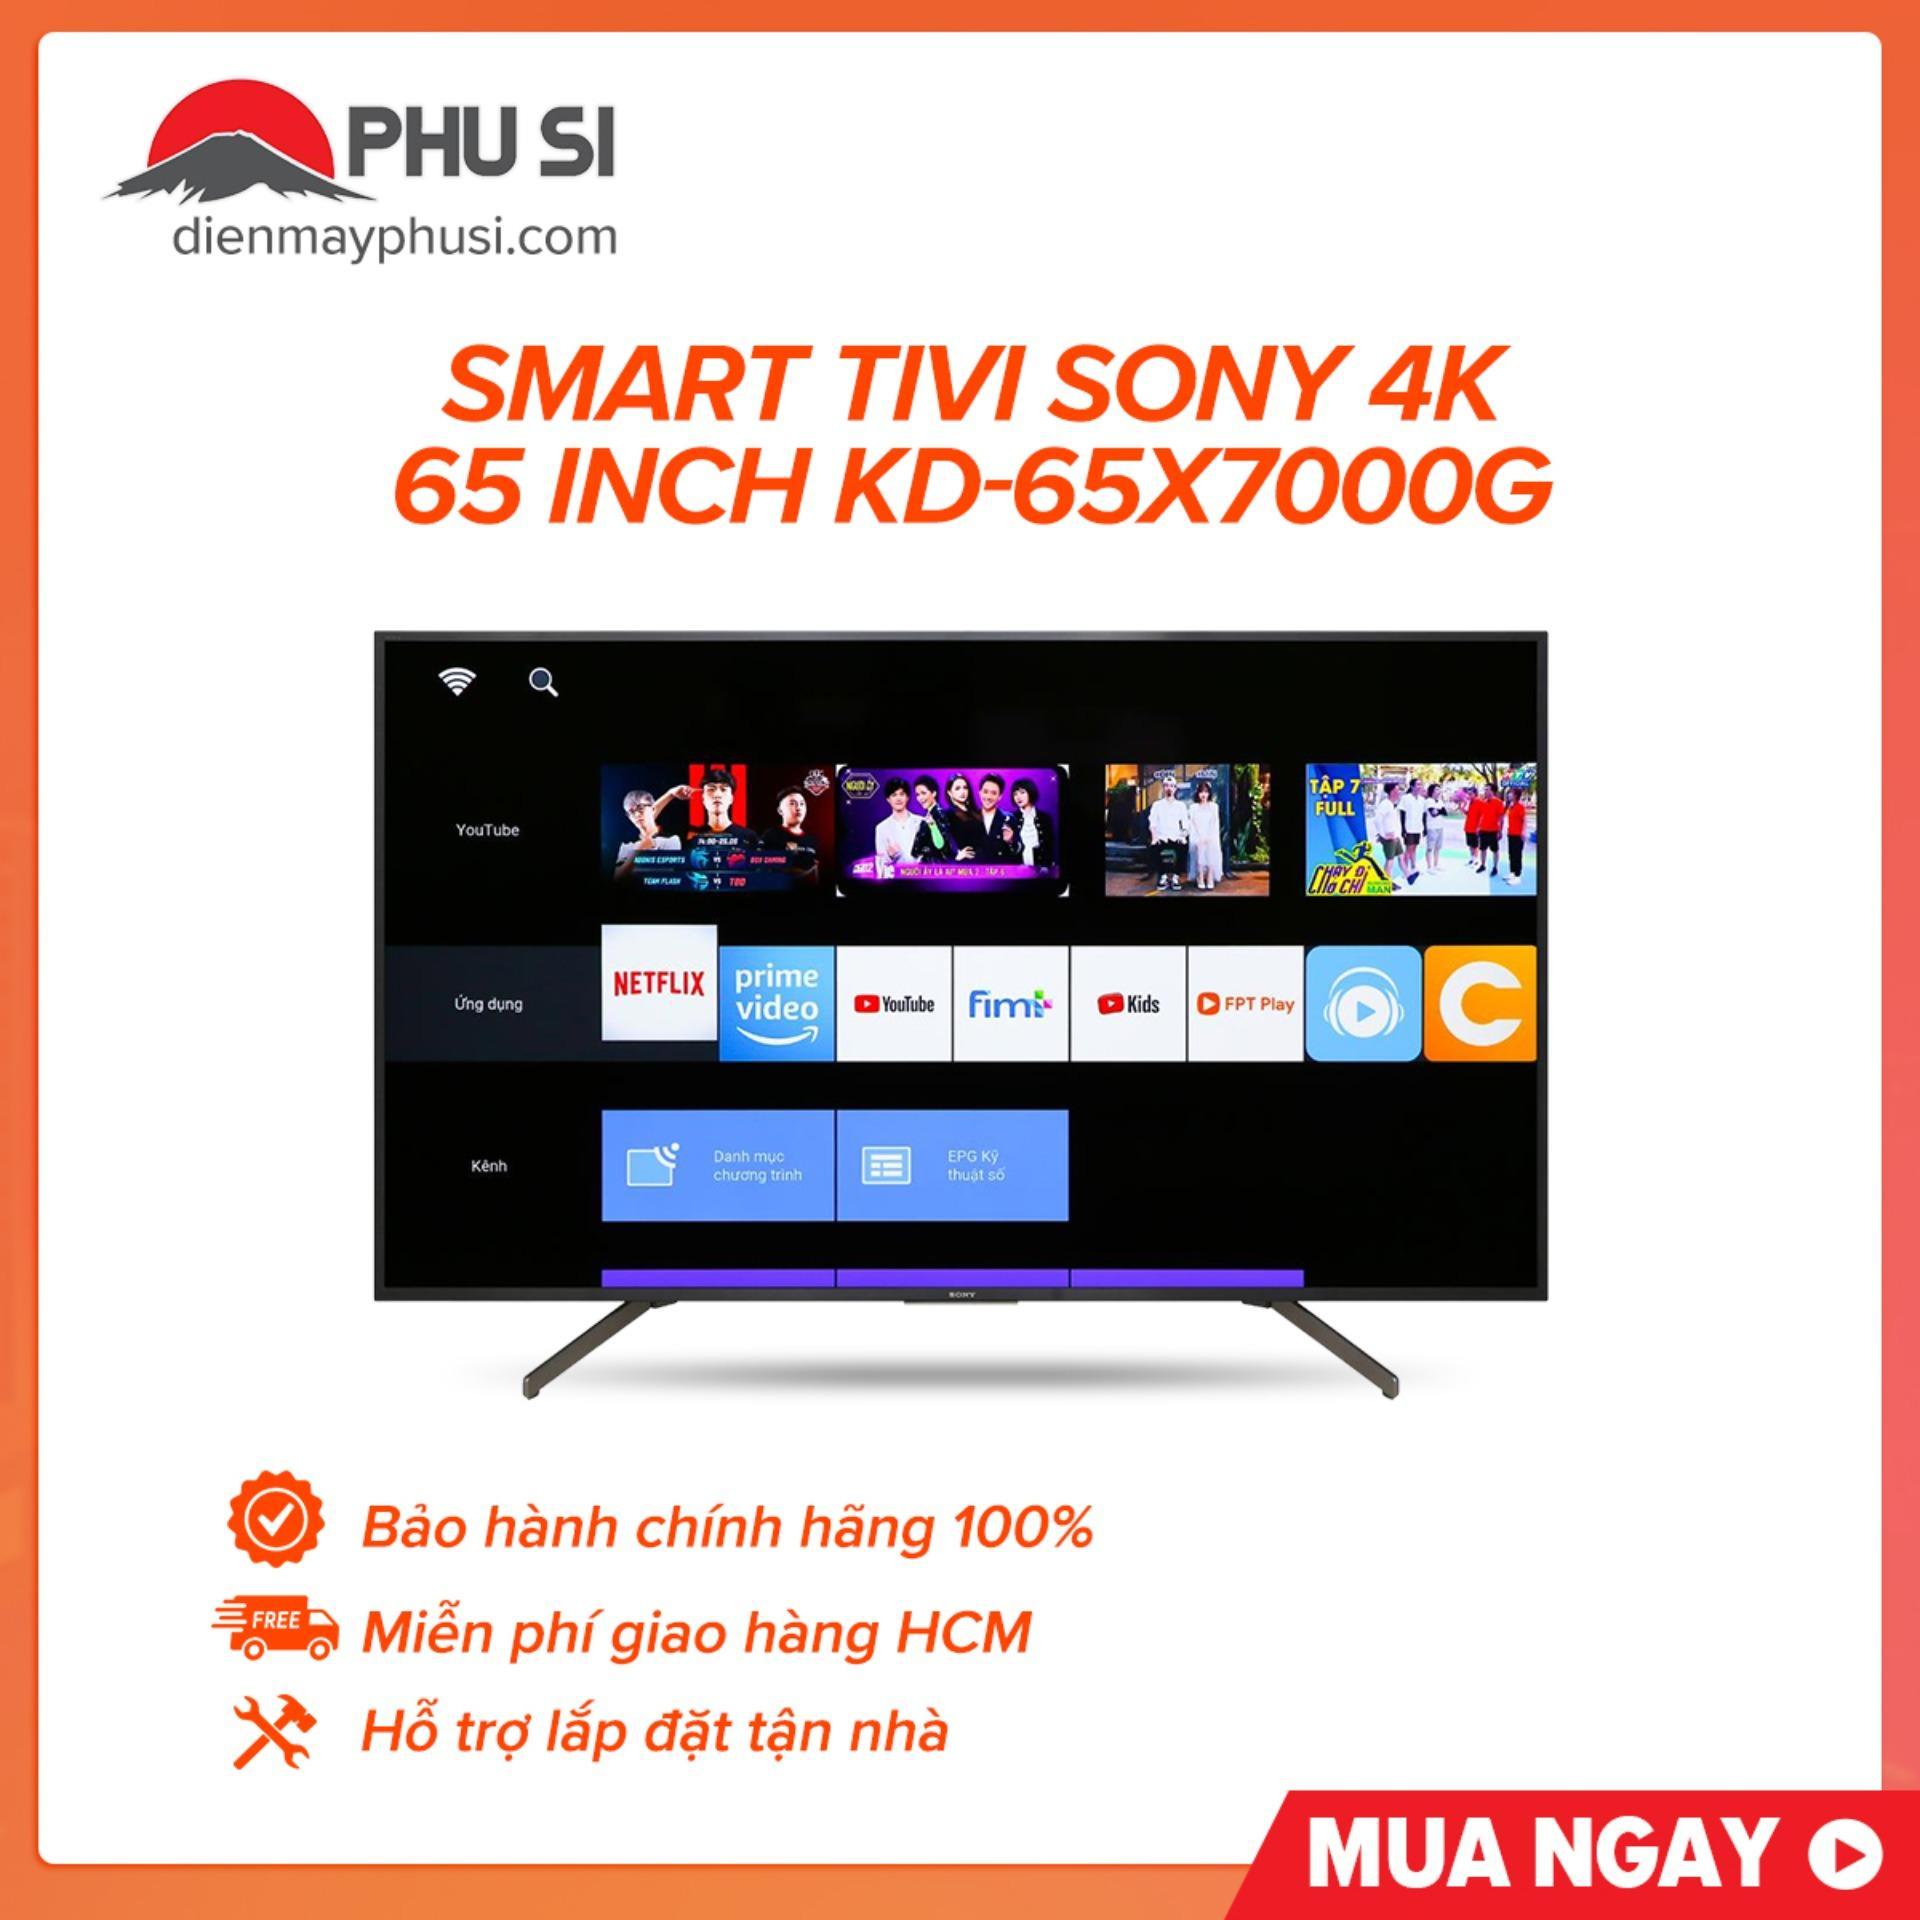 Bảng giá Smart Tivi Sony 4K 65 inch KD-65X7000G